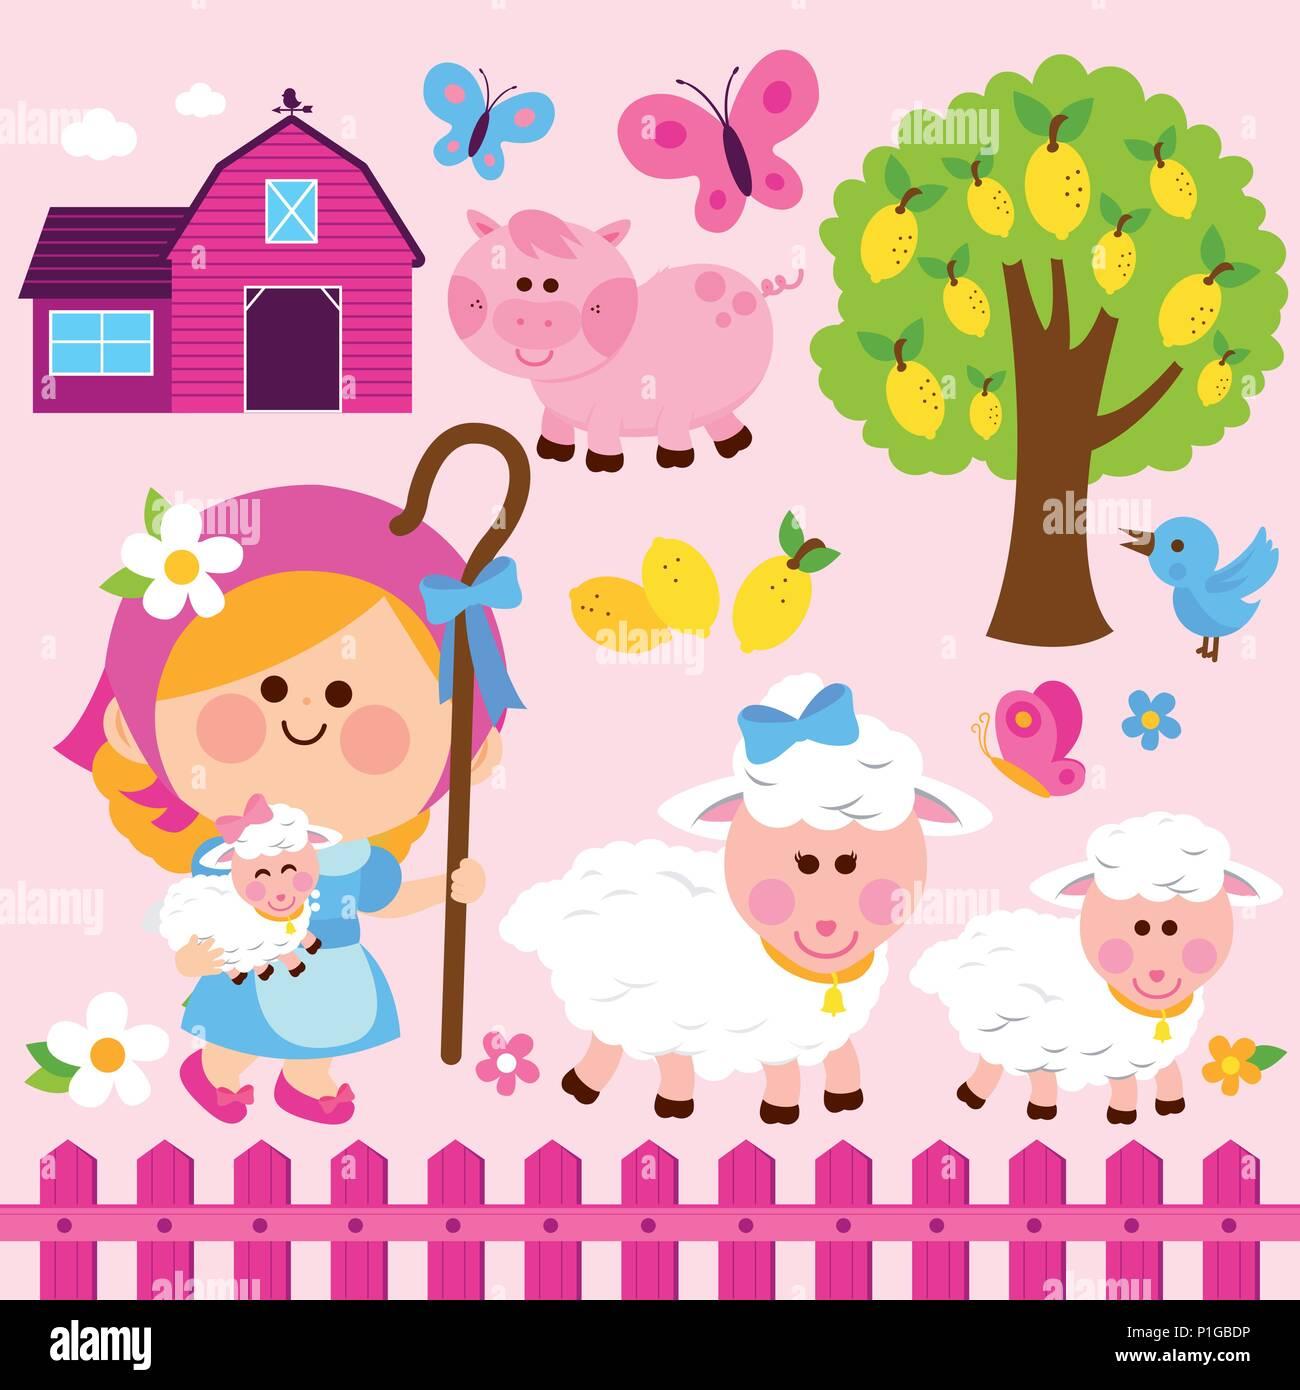 Shepherd And Sheep Stock Vector Images - Alamy